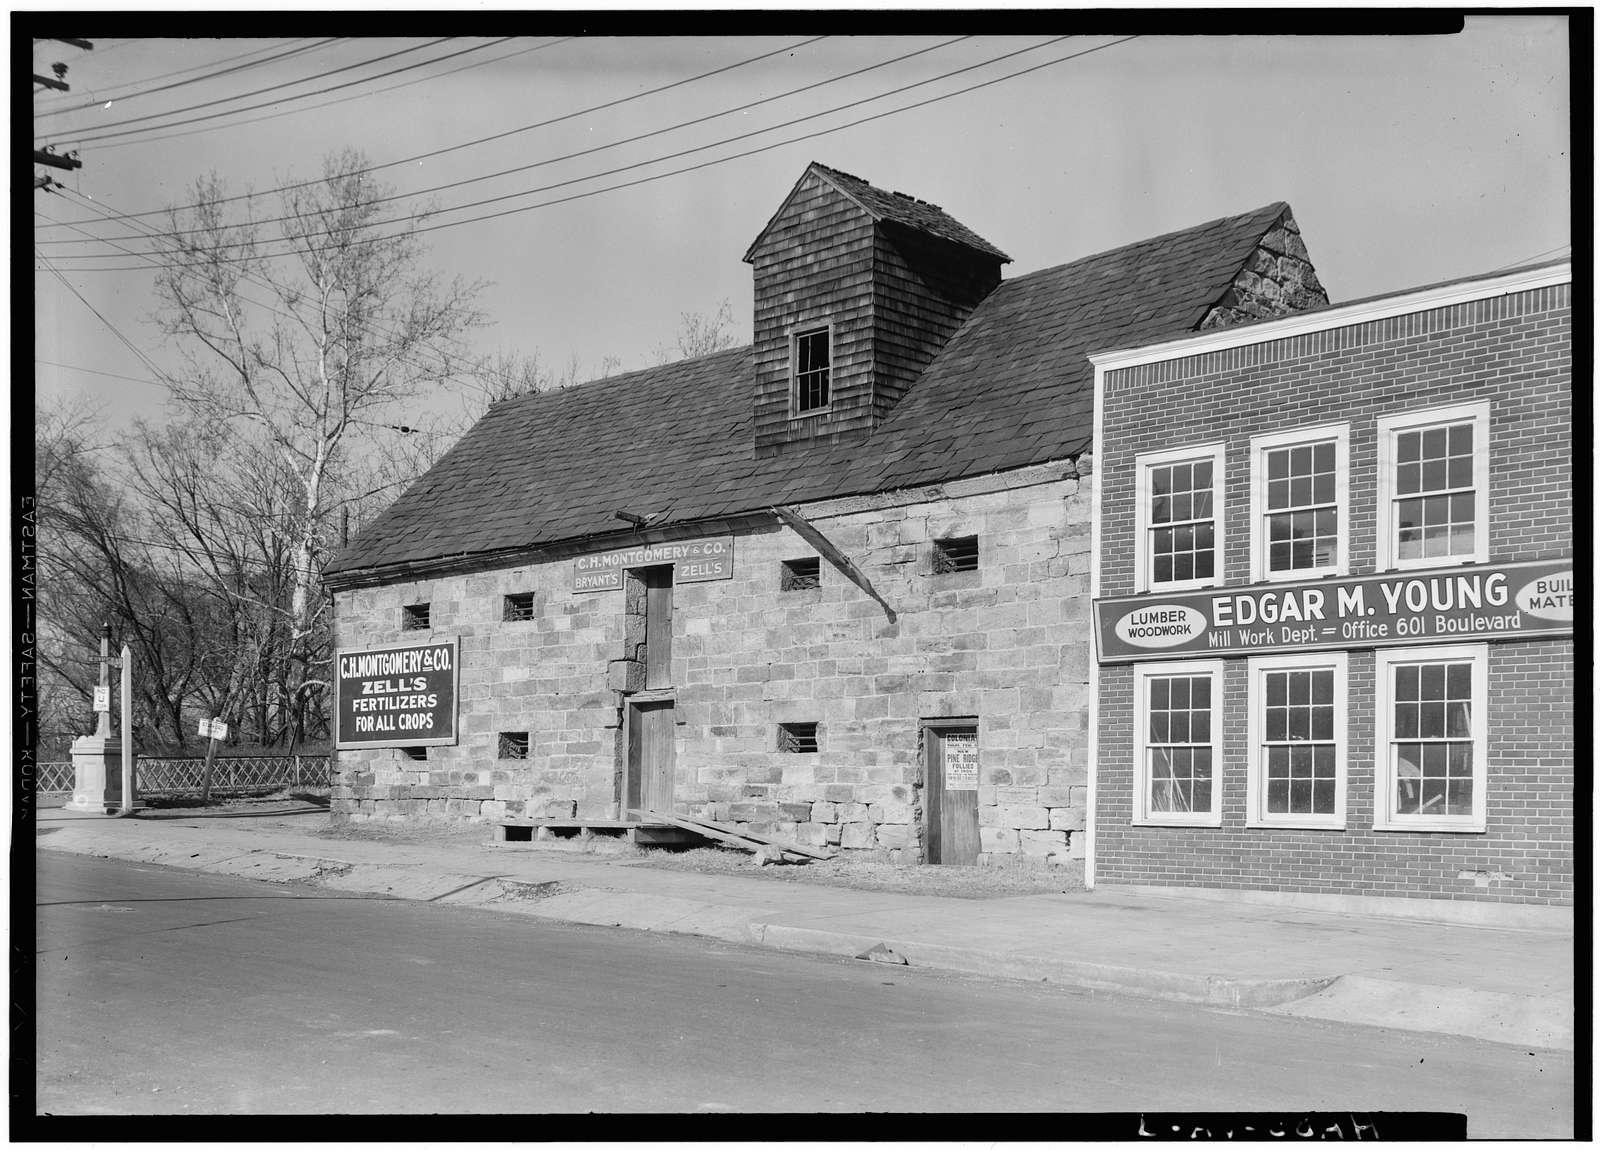 Stone Warehouse, 915 Sophia Street, Fredericksburg, Fredericksburg, VA